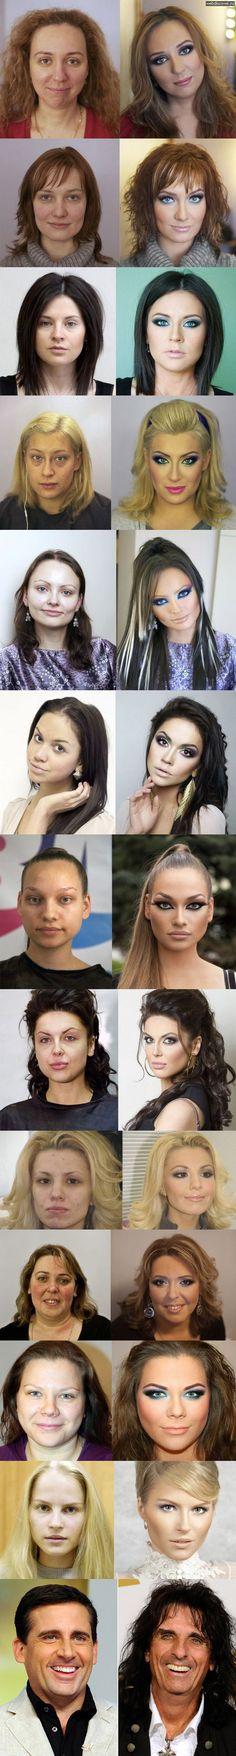 Celebrities : Before Makeup And After Makeup